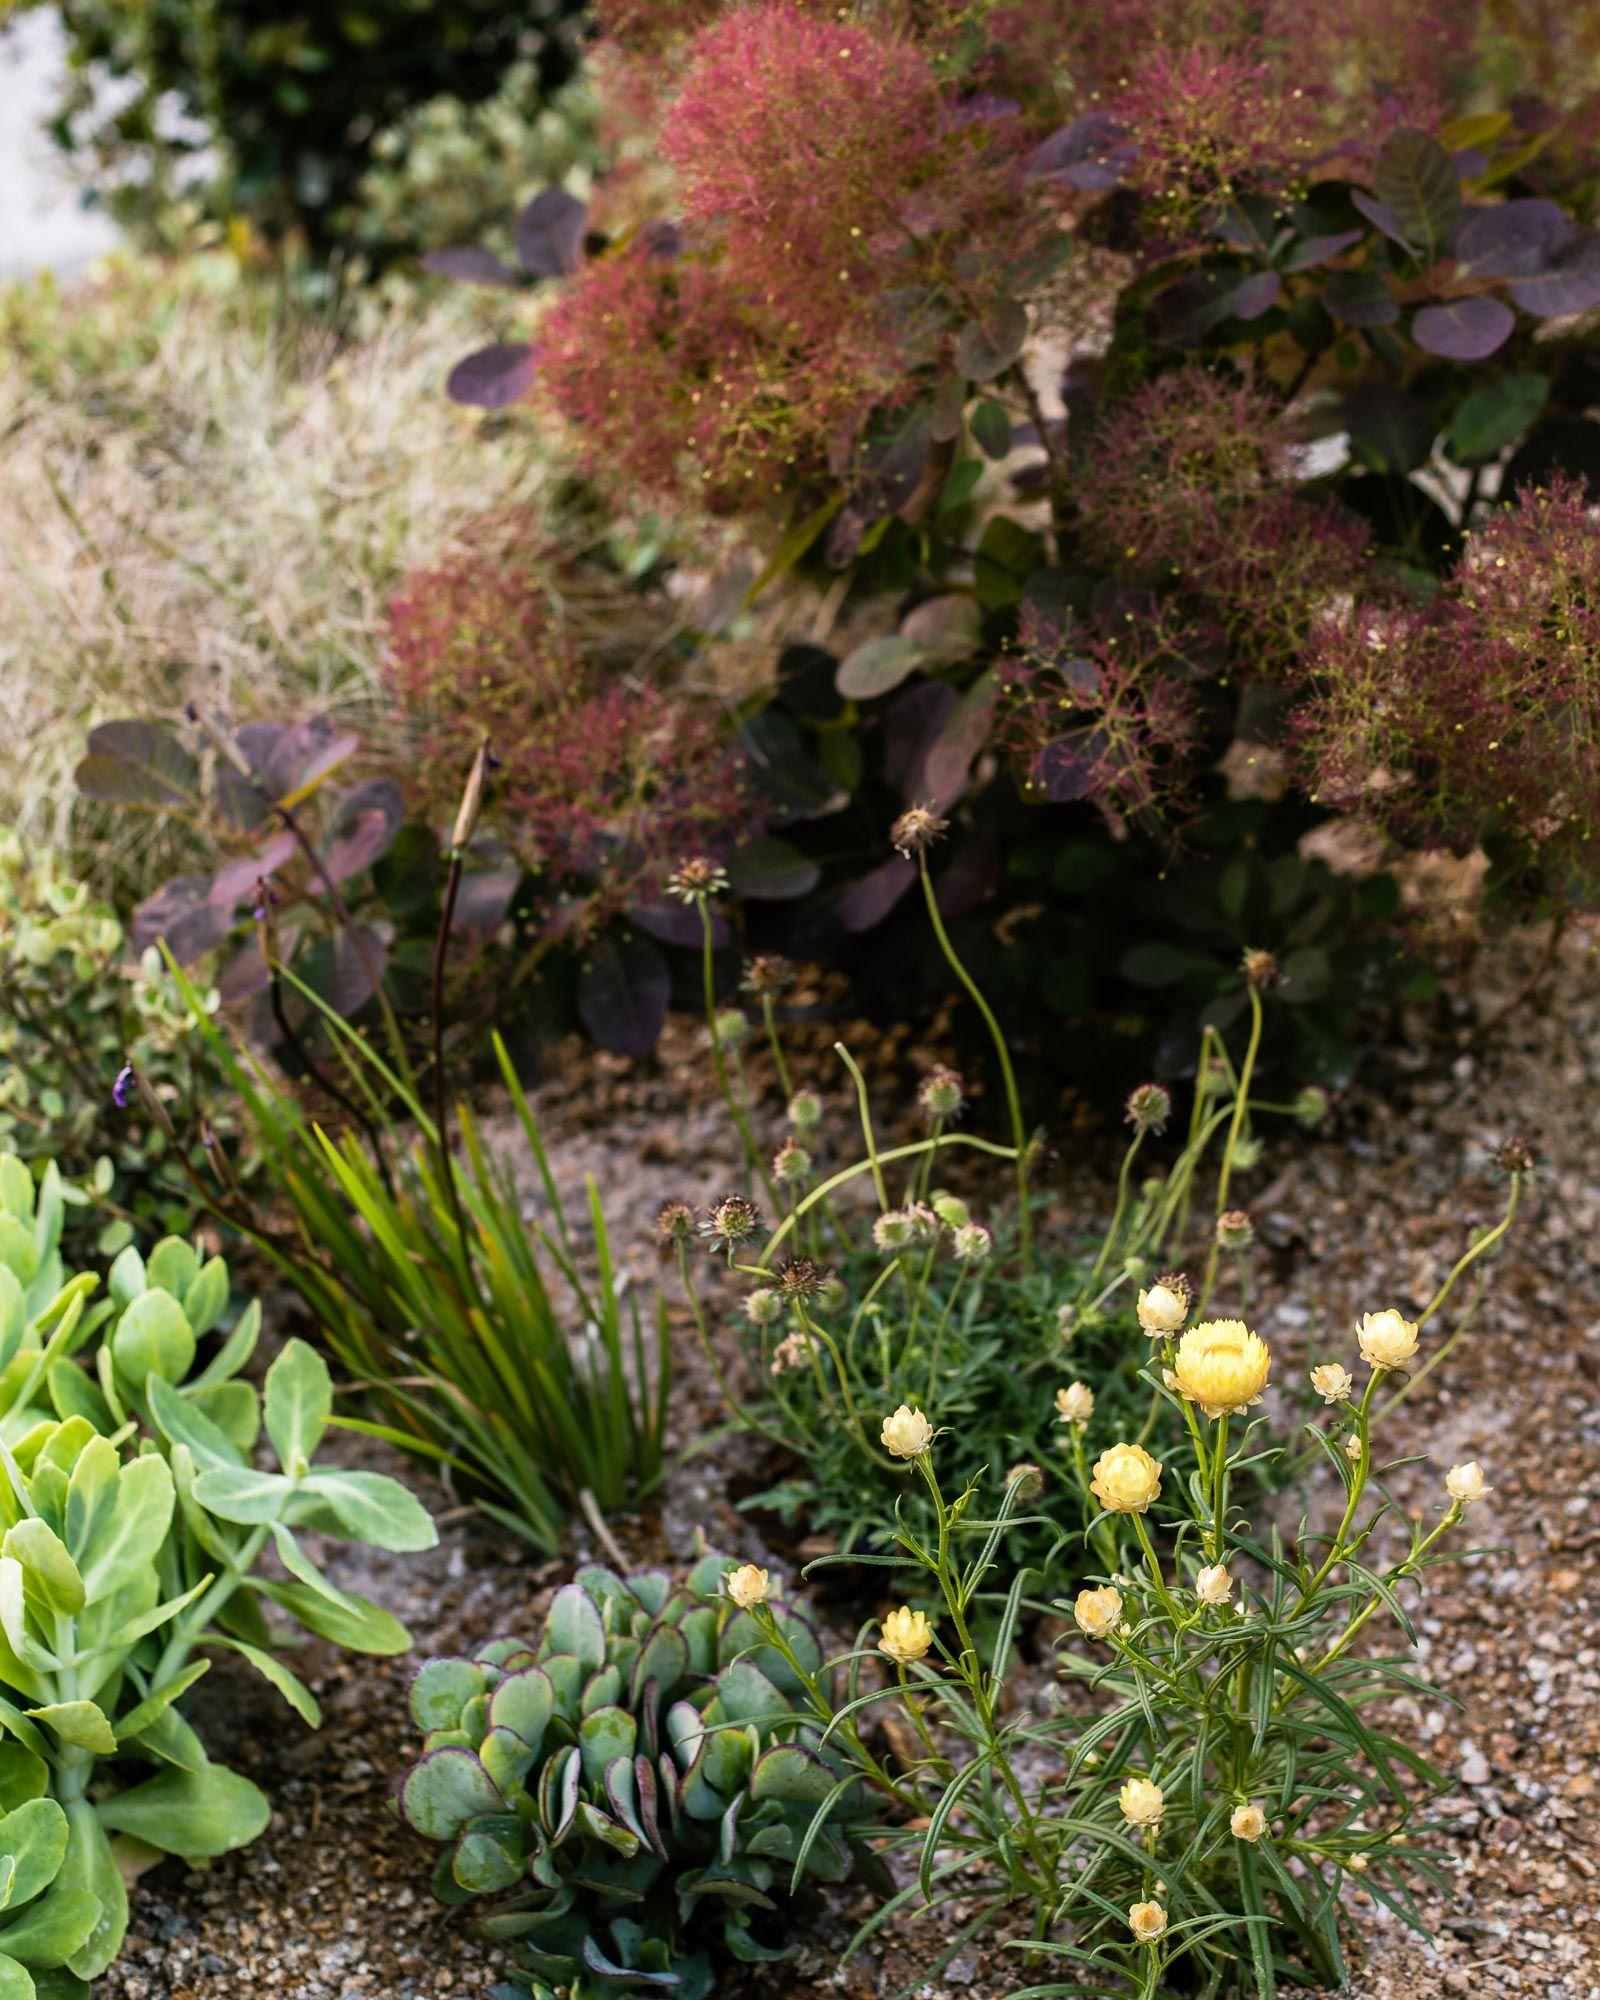 We swing by landscape designer phillip witherus garden at this